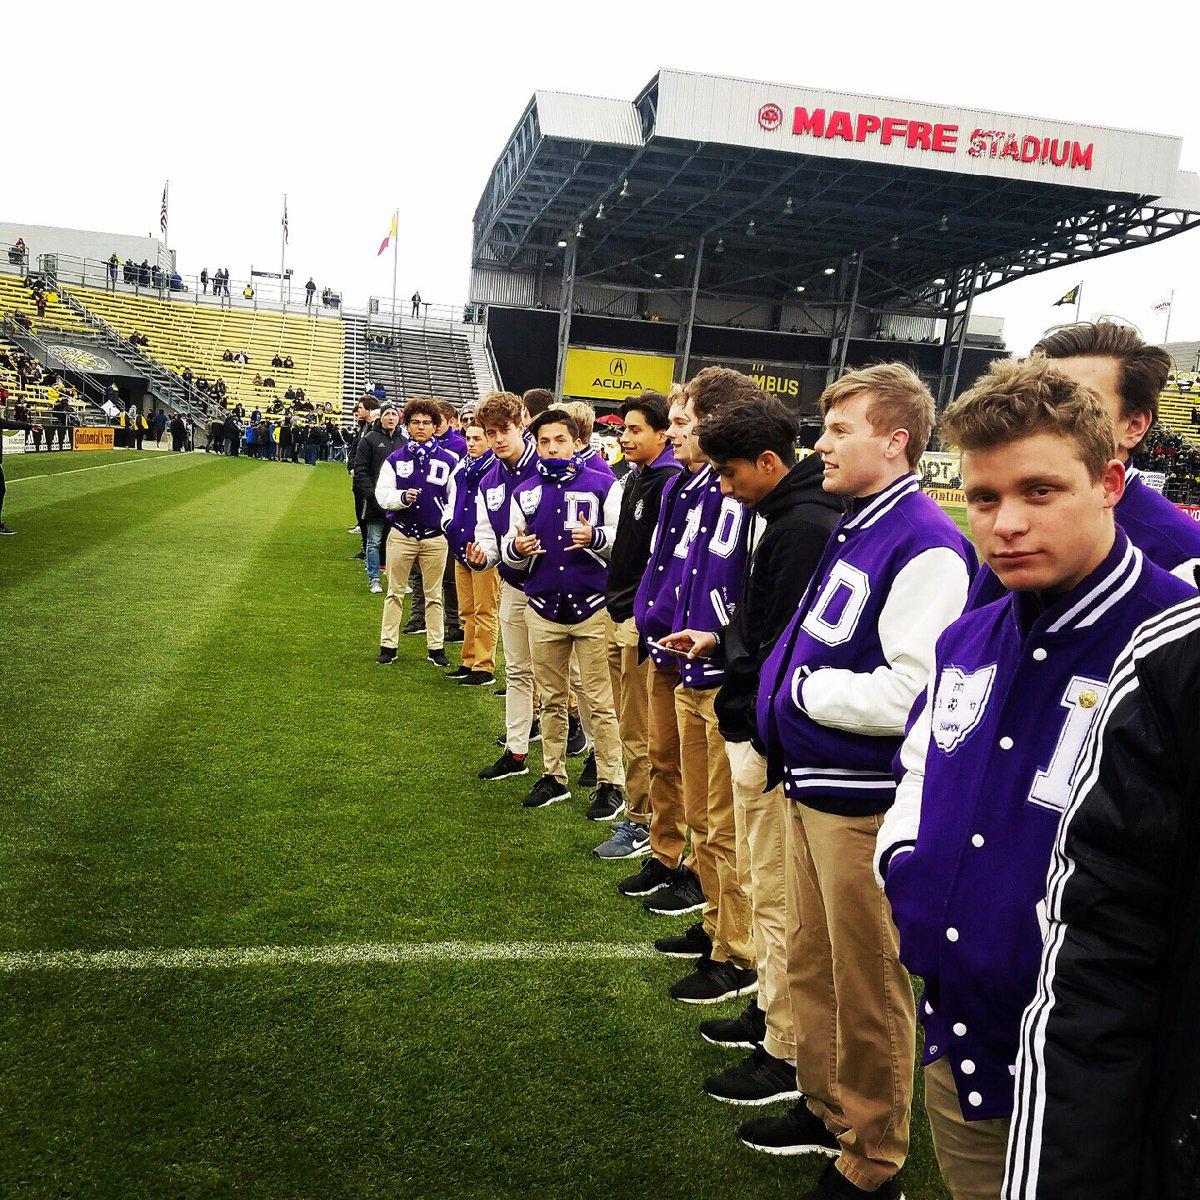 637805202ce SFD Boys Soccer, St. Francis DeSales, Columbus Crew SC and MAPFRE Stadium